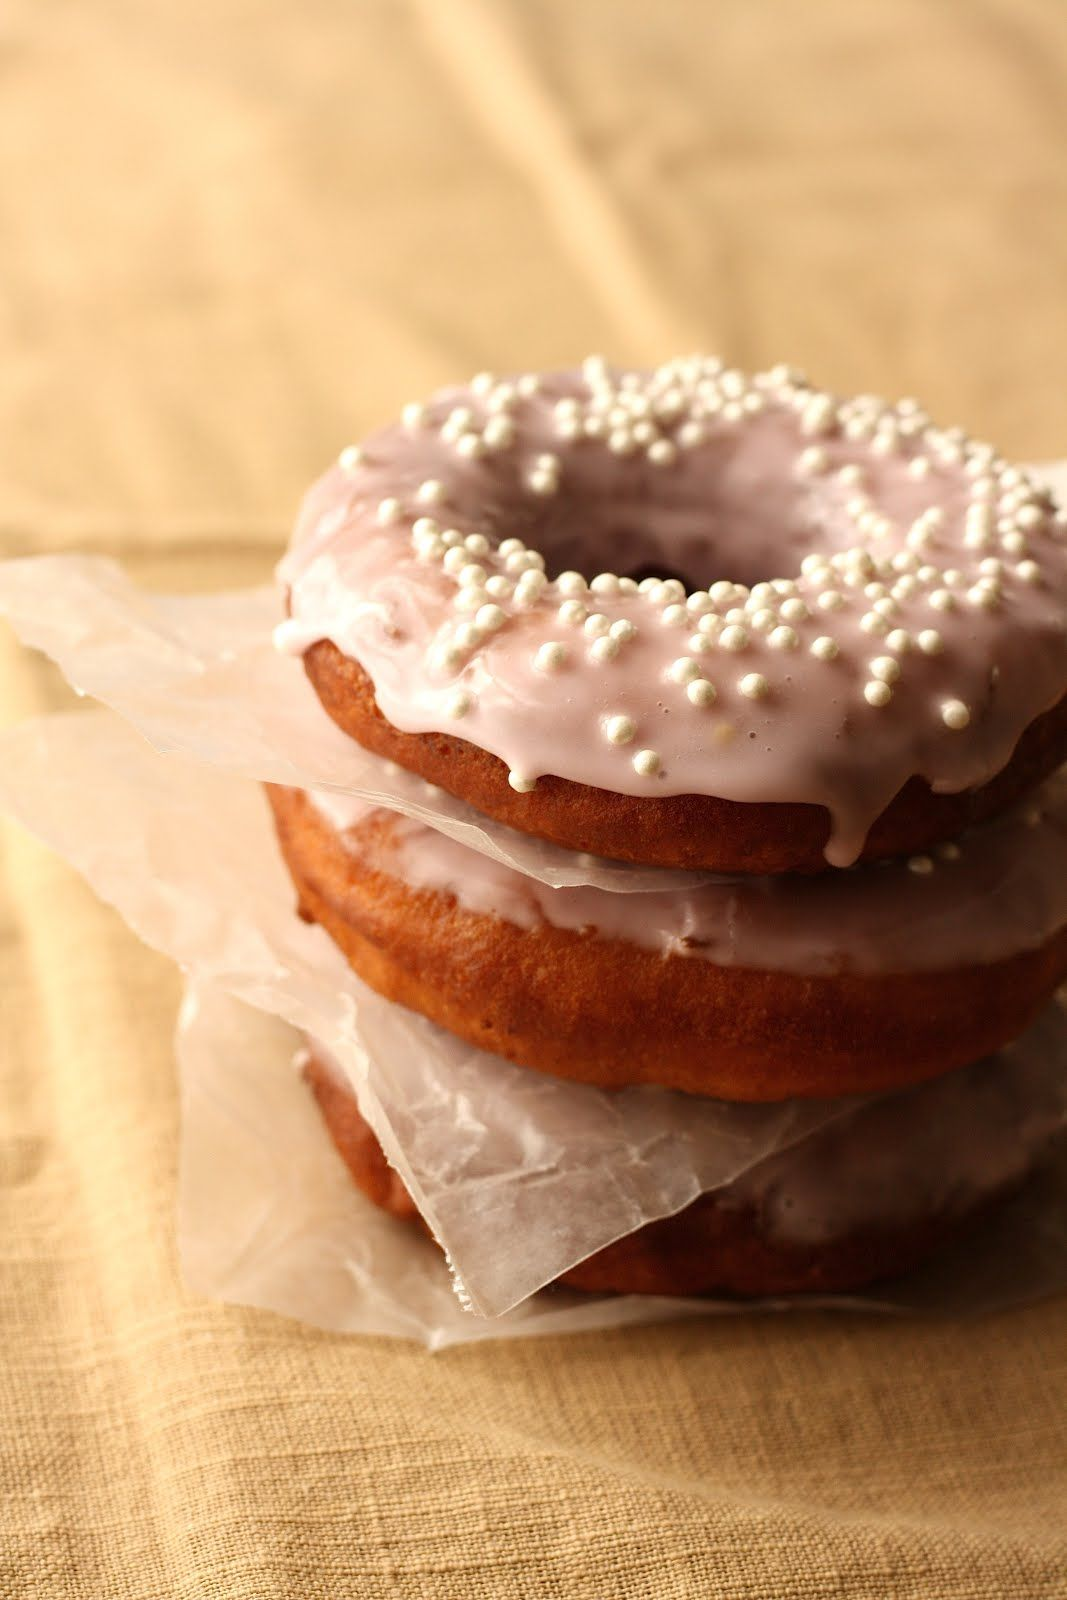 Classic Raised Donuts